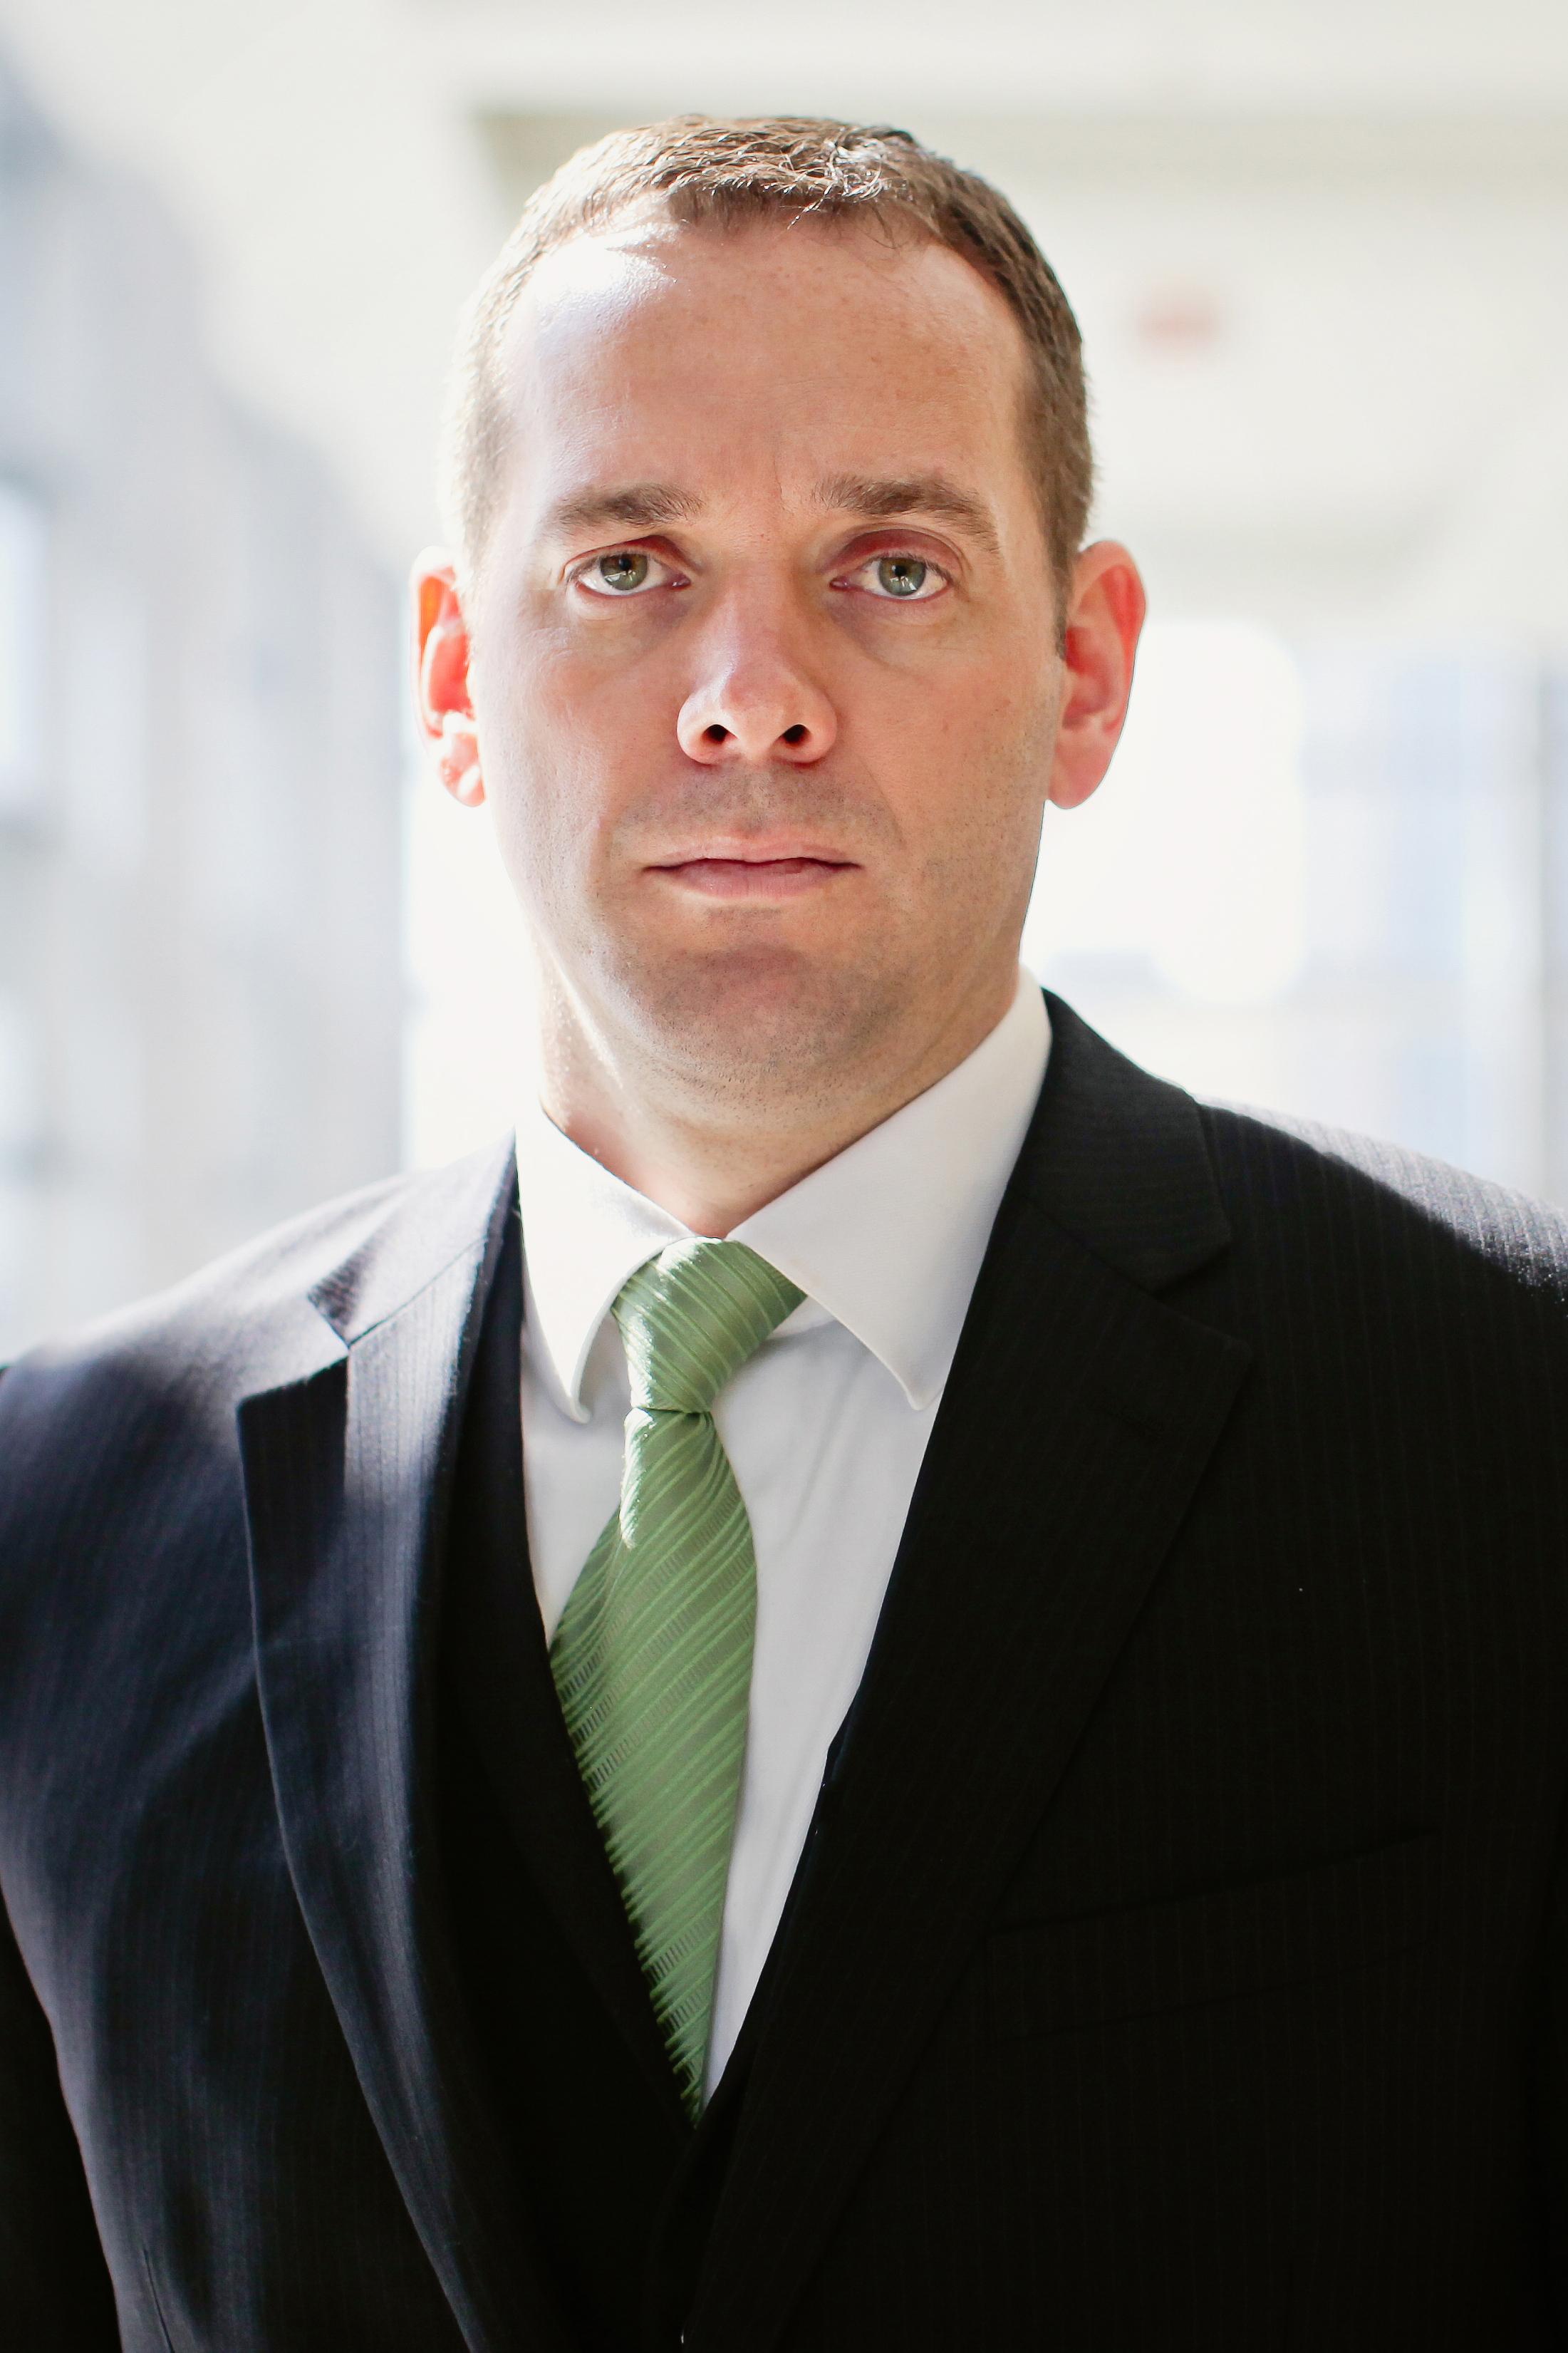 brandon-shroy-ohio-domestic-violence-defense-attorney